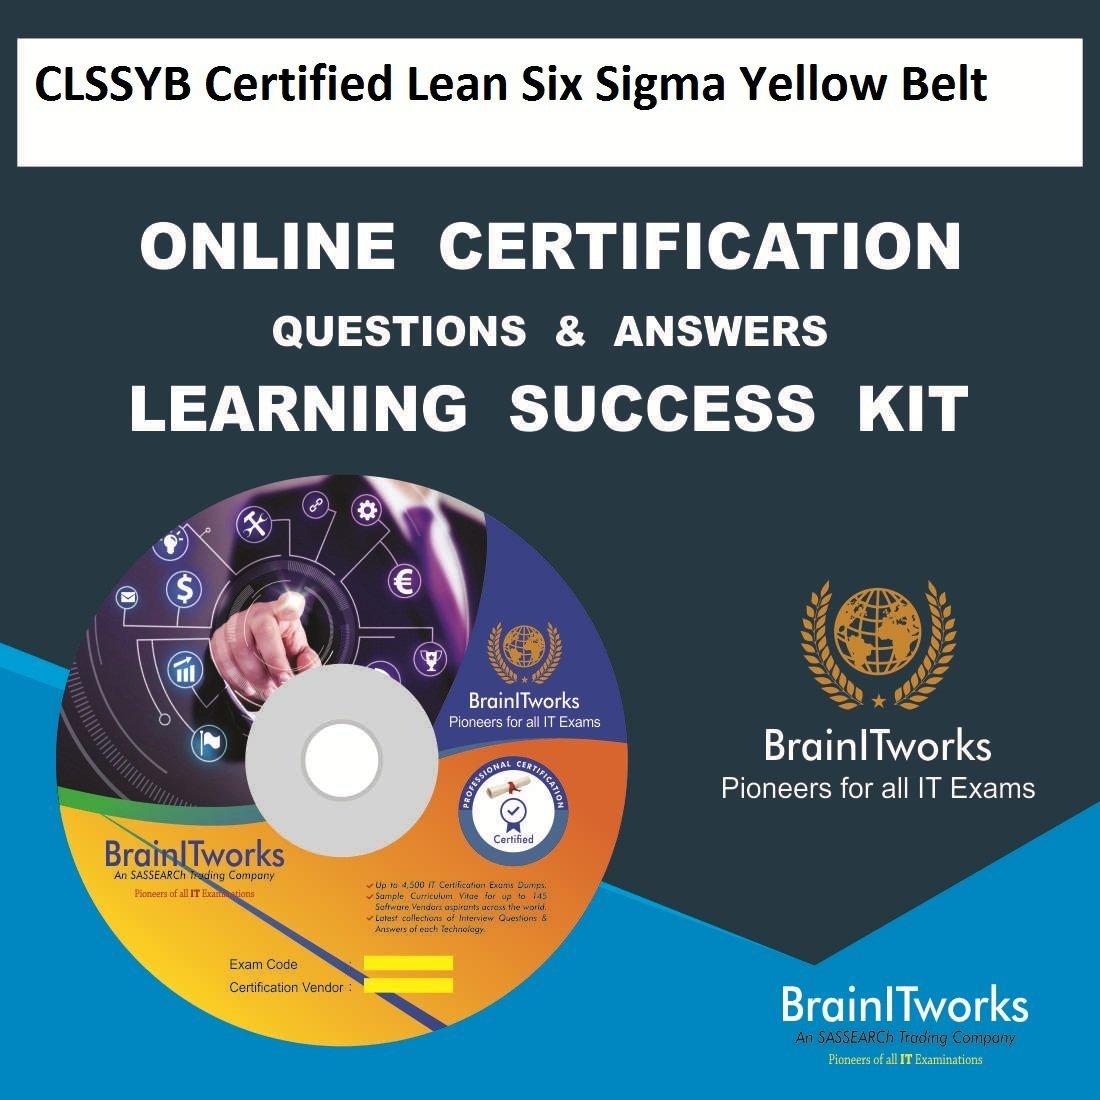 Amazon Clssyb Certified Lean Six Sigma Yellow Belt Online